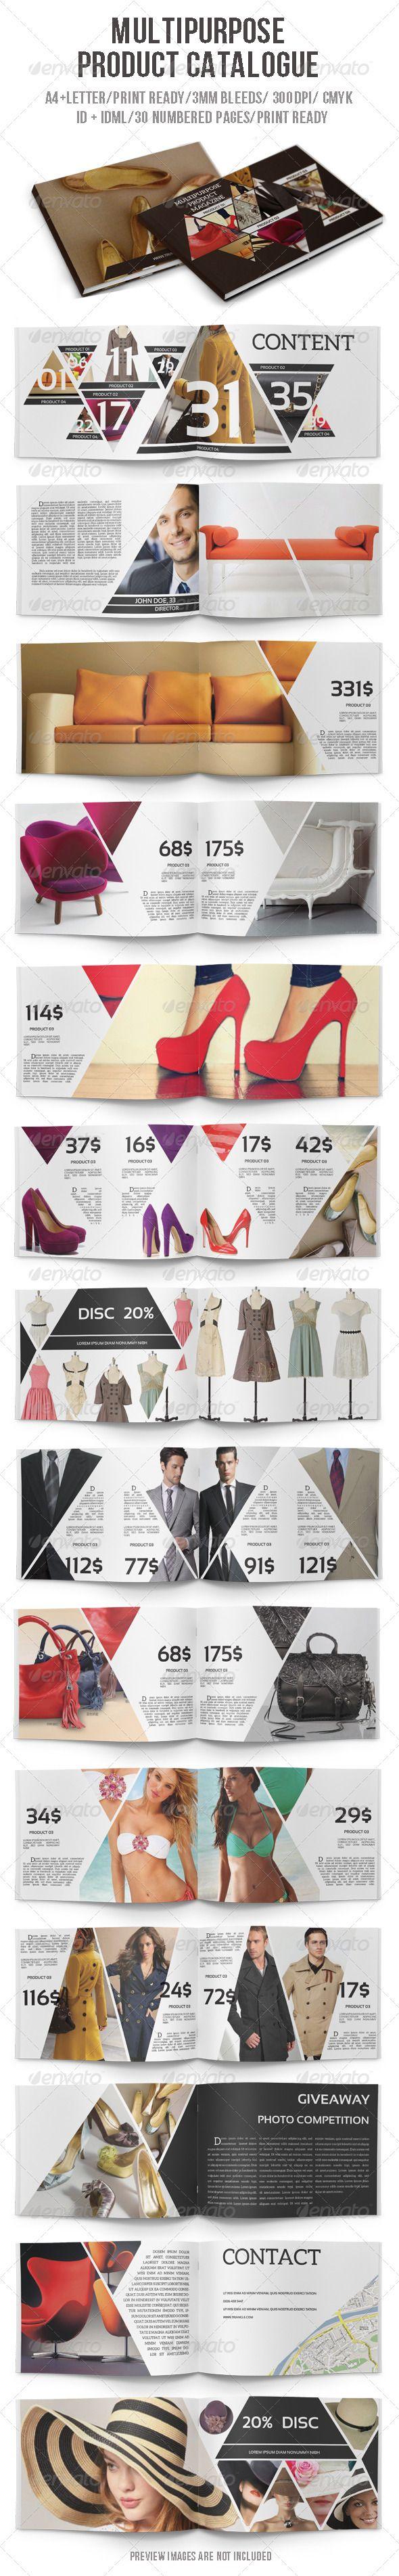 Multipurpose Product Catalogue #GraphicRiver